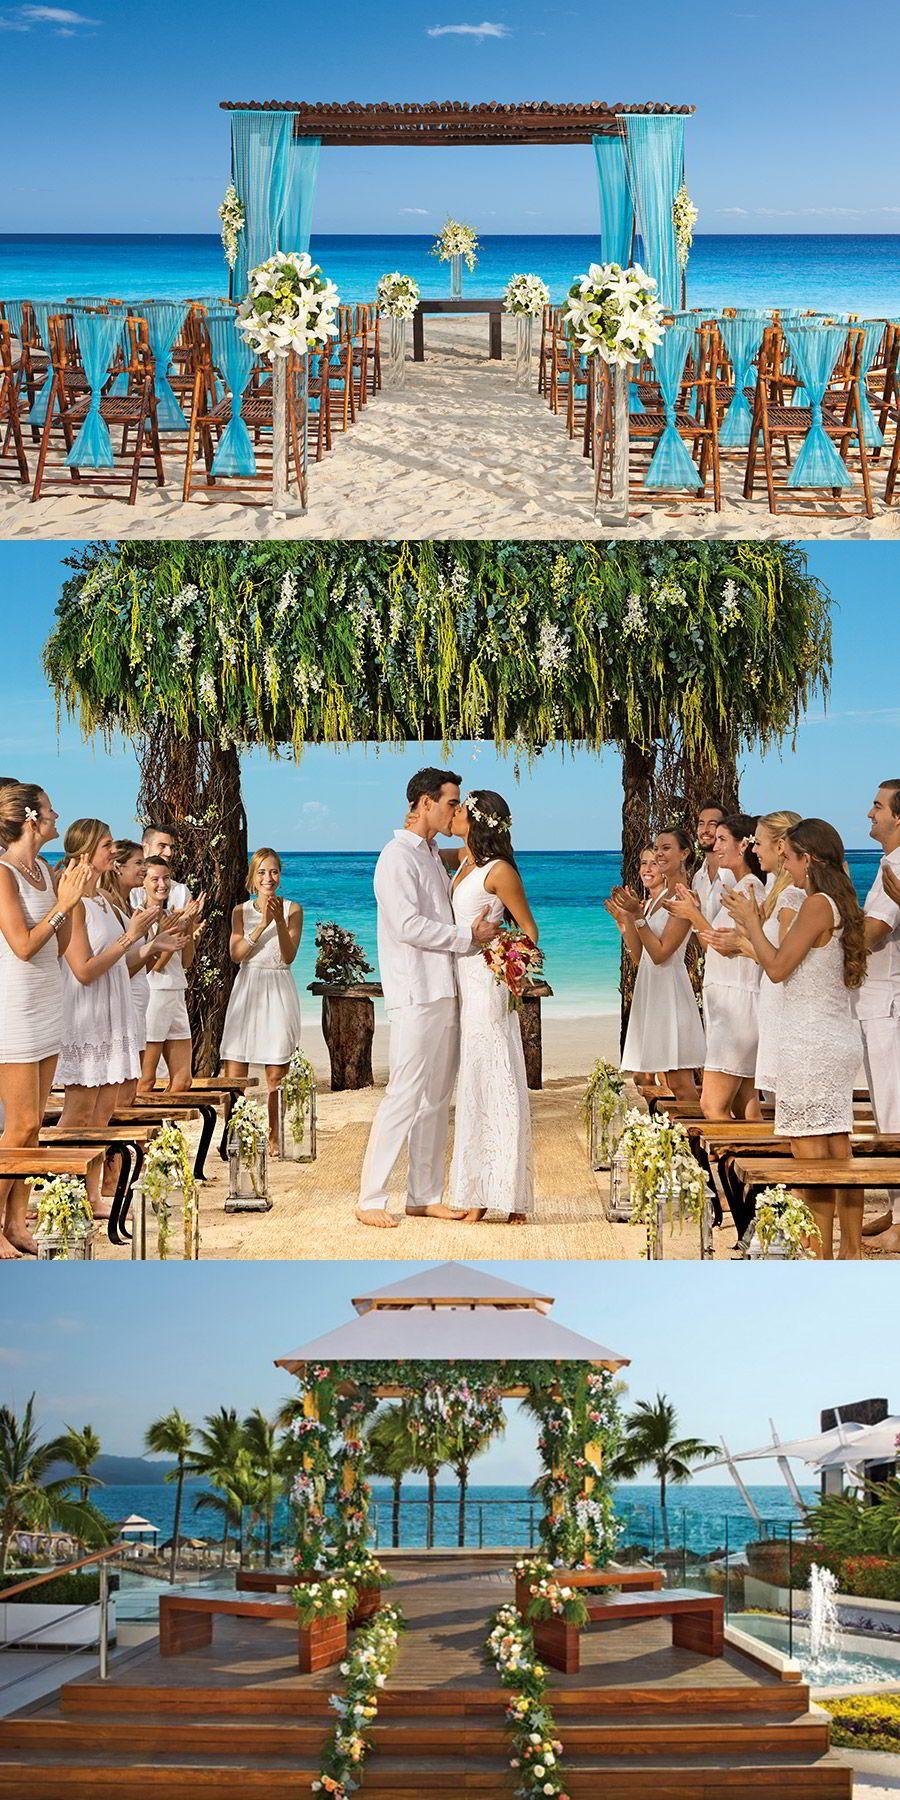 Luxurious Destination Weddings at Secrets Resorts & Spas ...